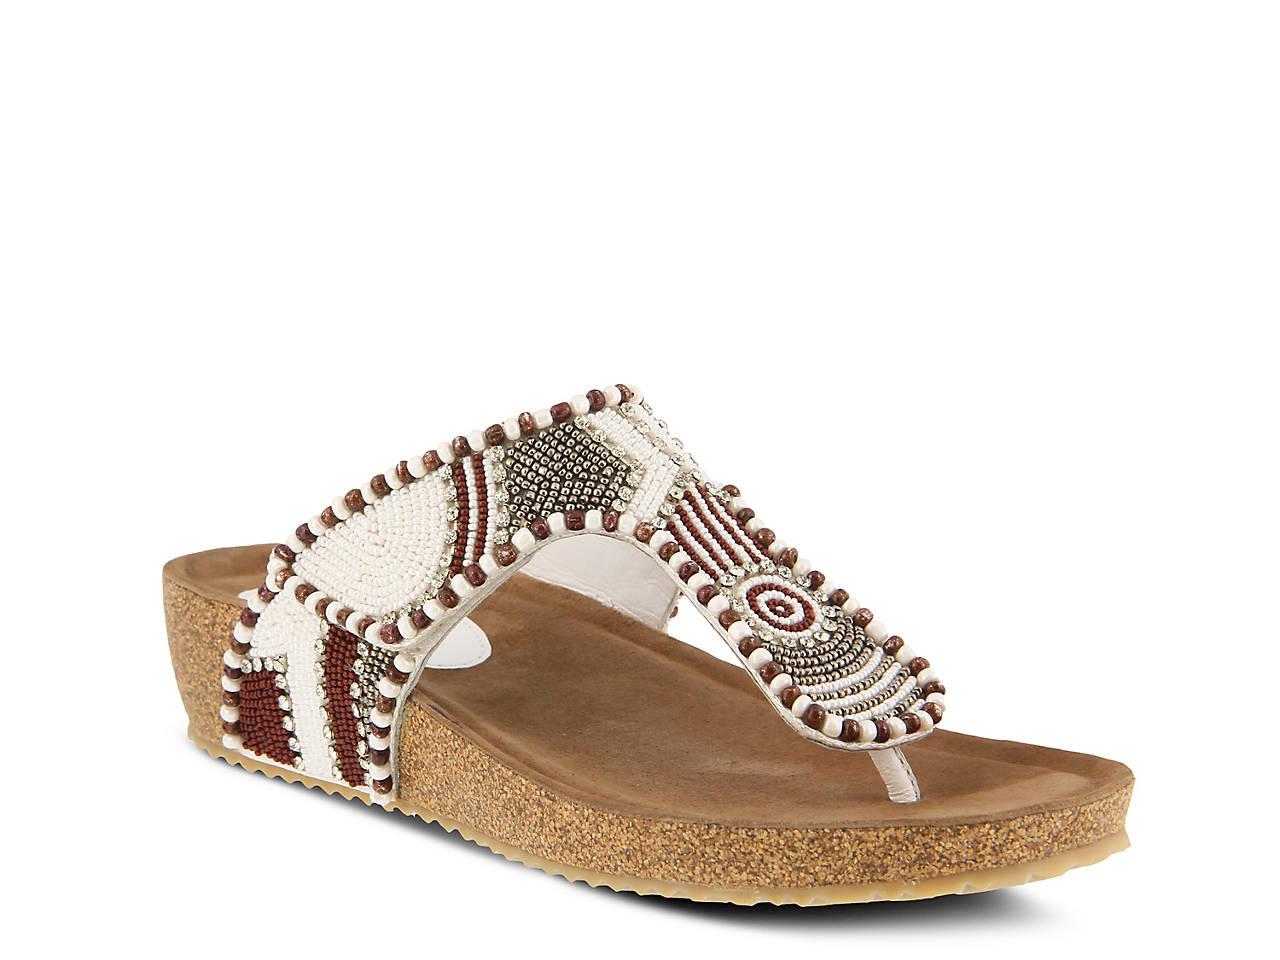 Lachlana Wedge Sandal by Azura